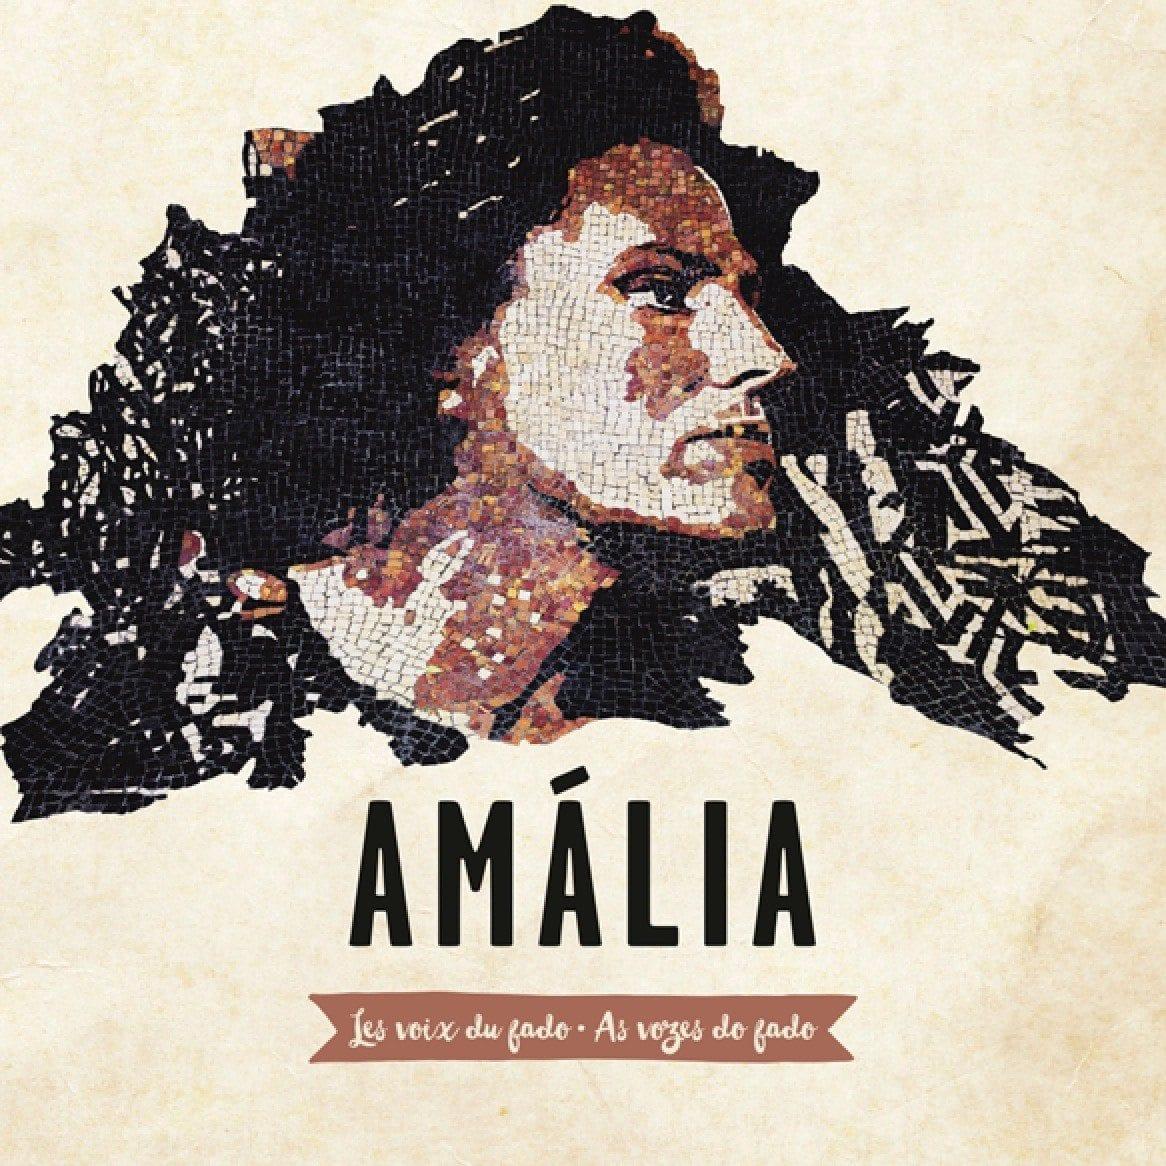 Amalia Rodrigues: Les voix du fado (albums à gagner)